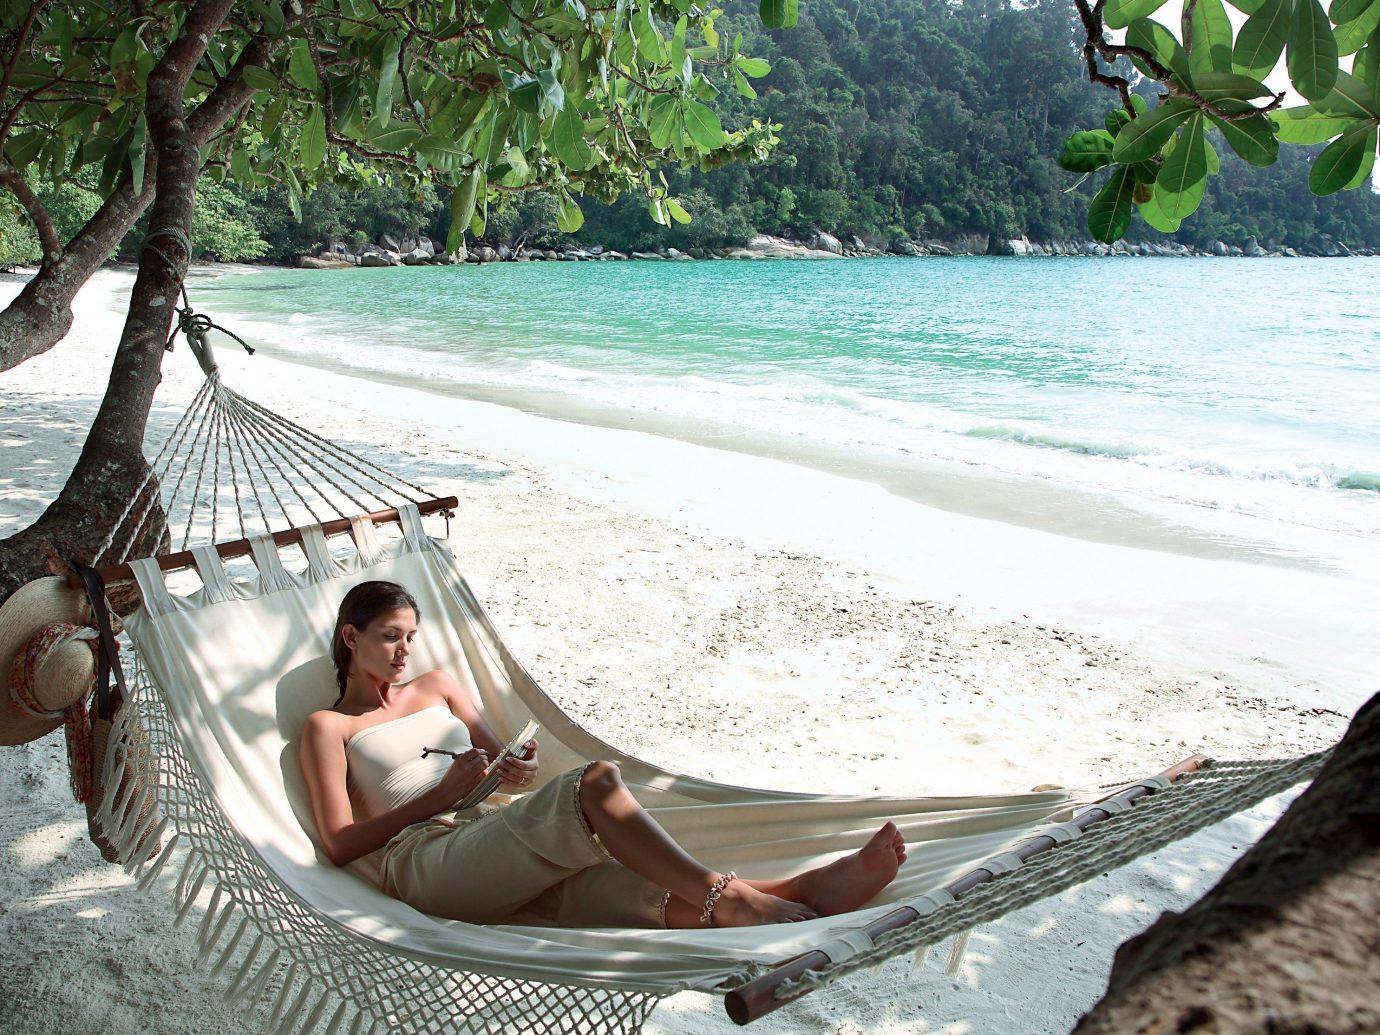 Girl in a hammock at Pangkor Laut Resort, Pangkor, Malaysia